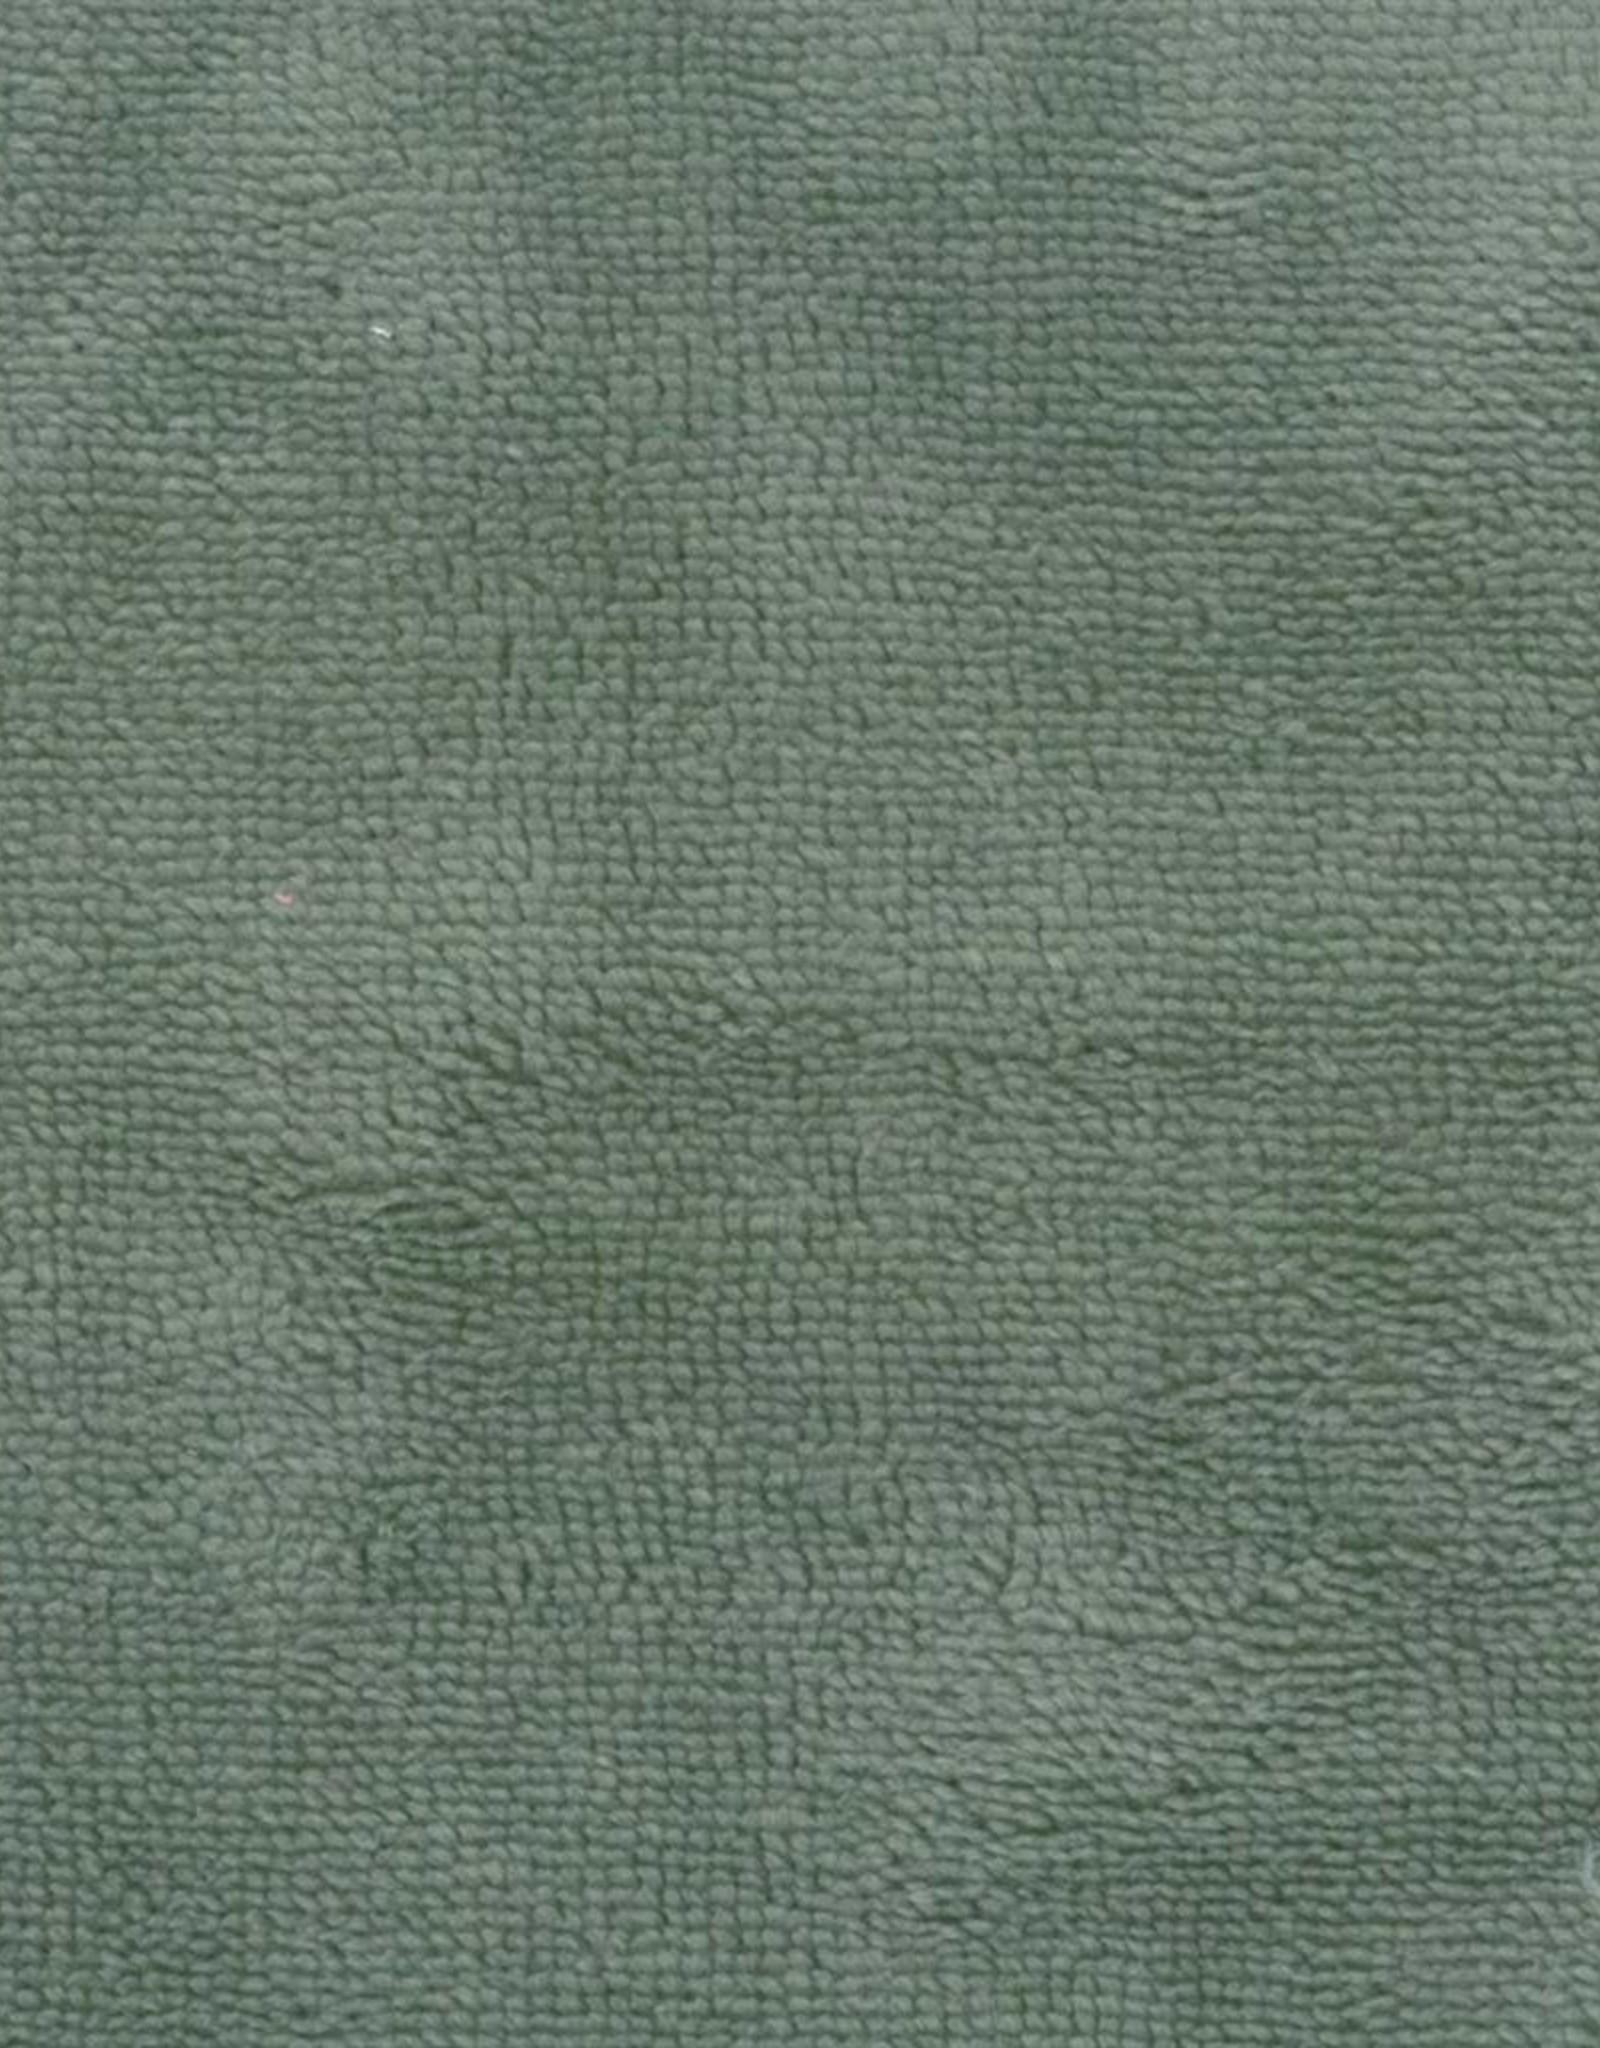 Domotex Bamboe micro terry badstof romarin mint